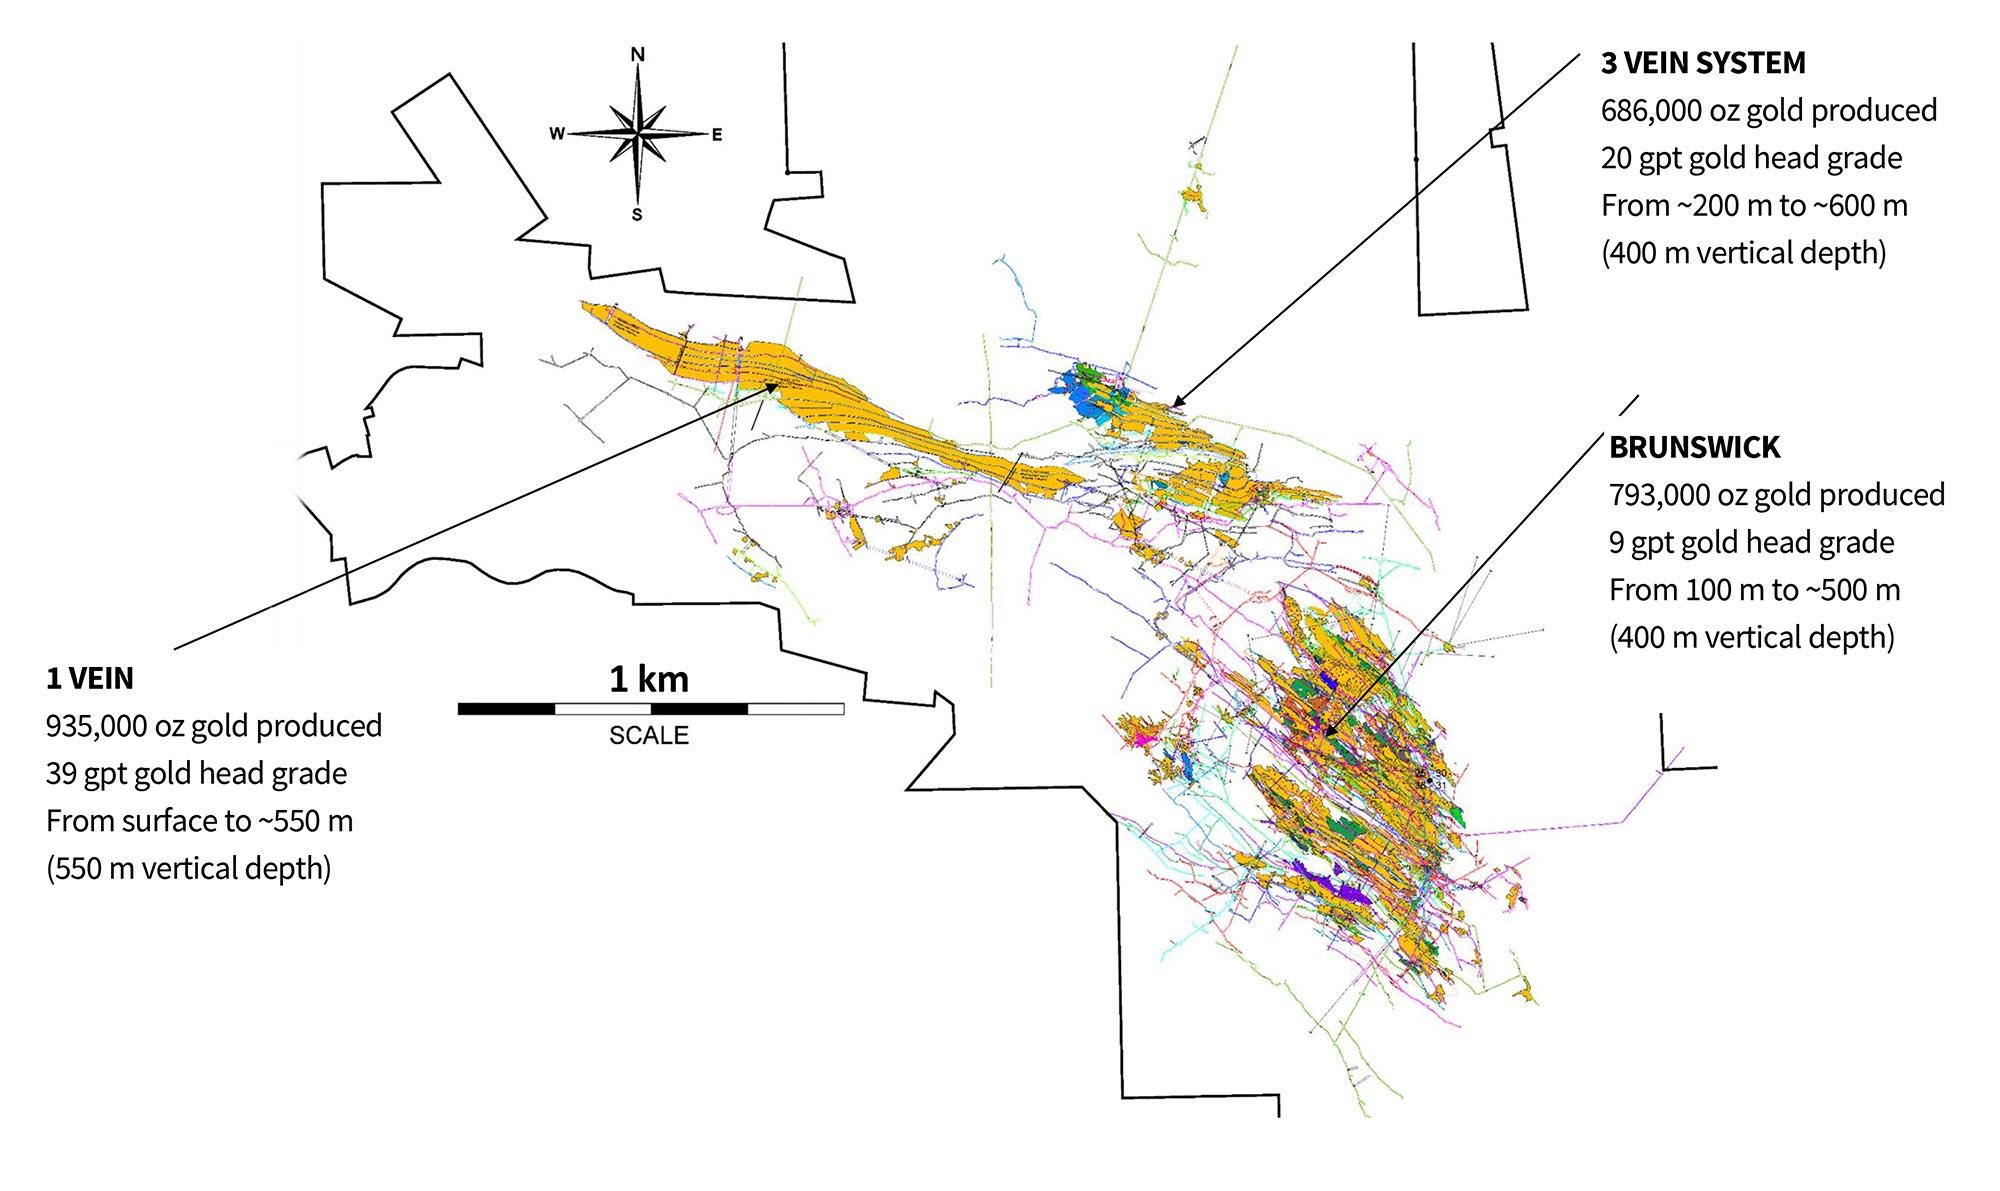 Idaho-Maryland Mine Plan: View Showing Mine Workings